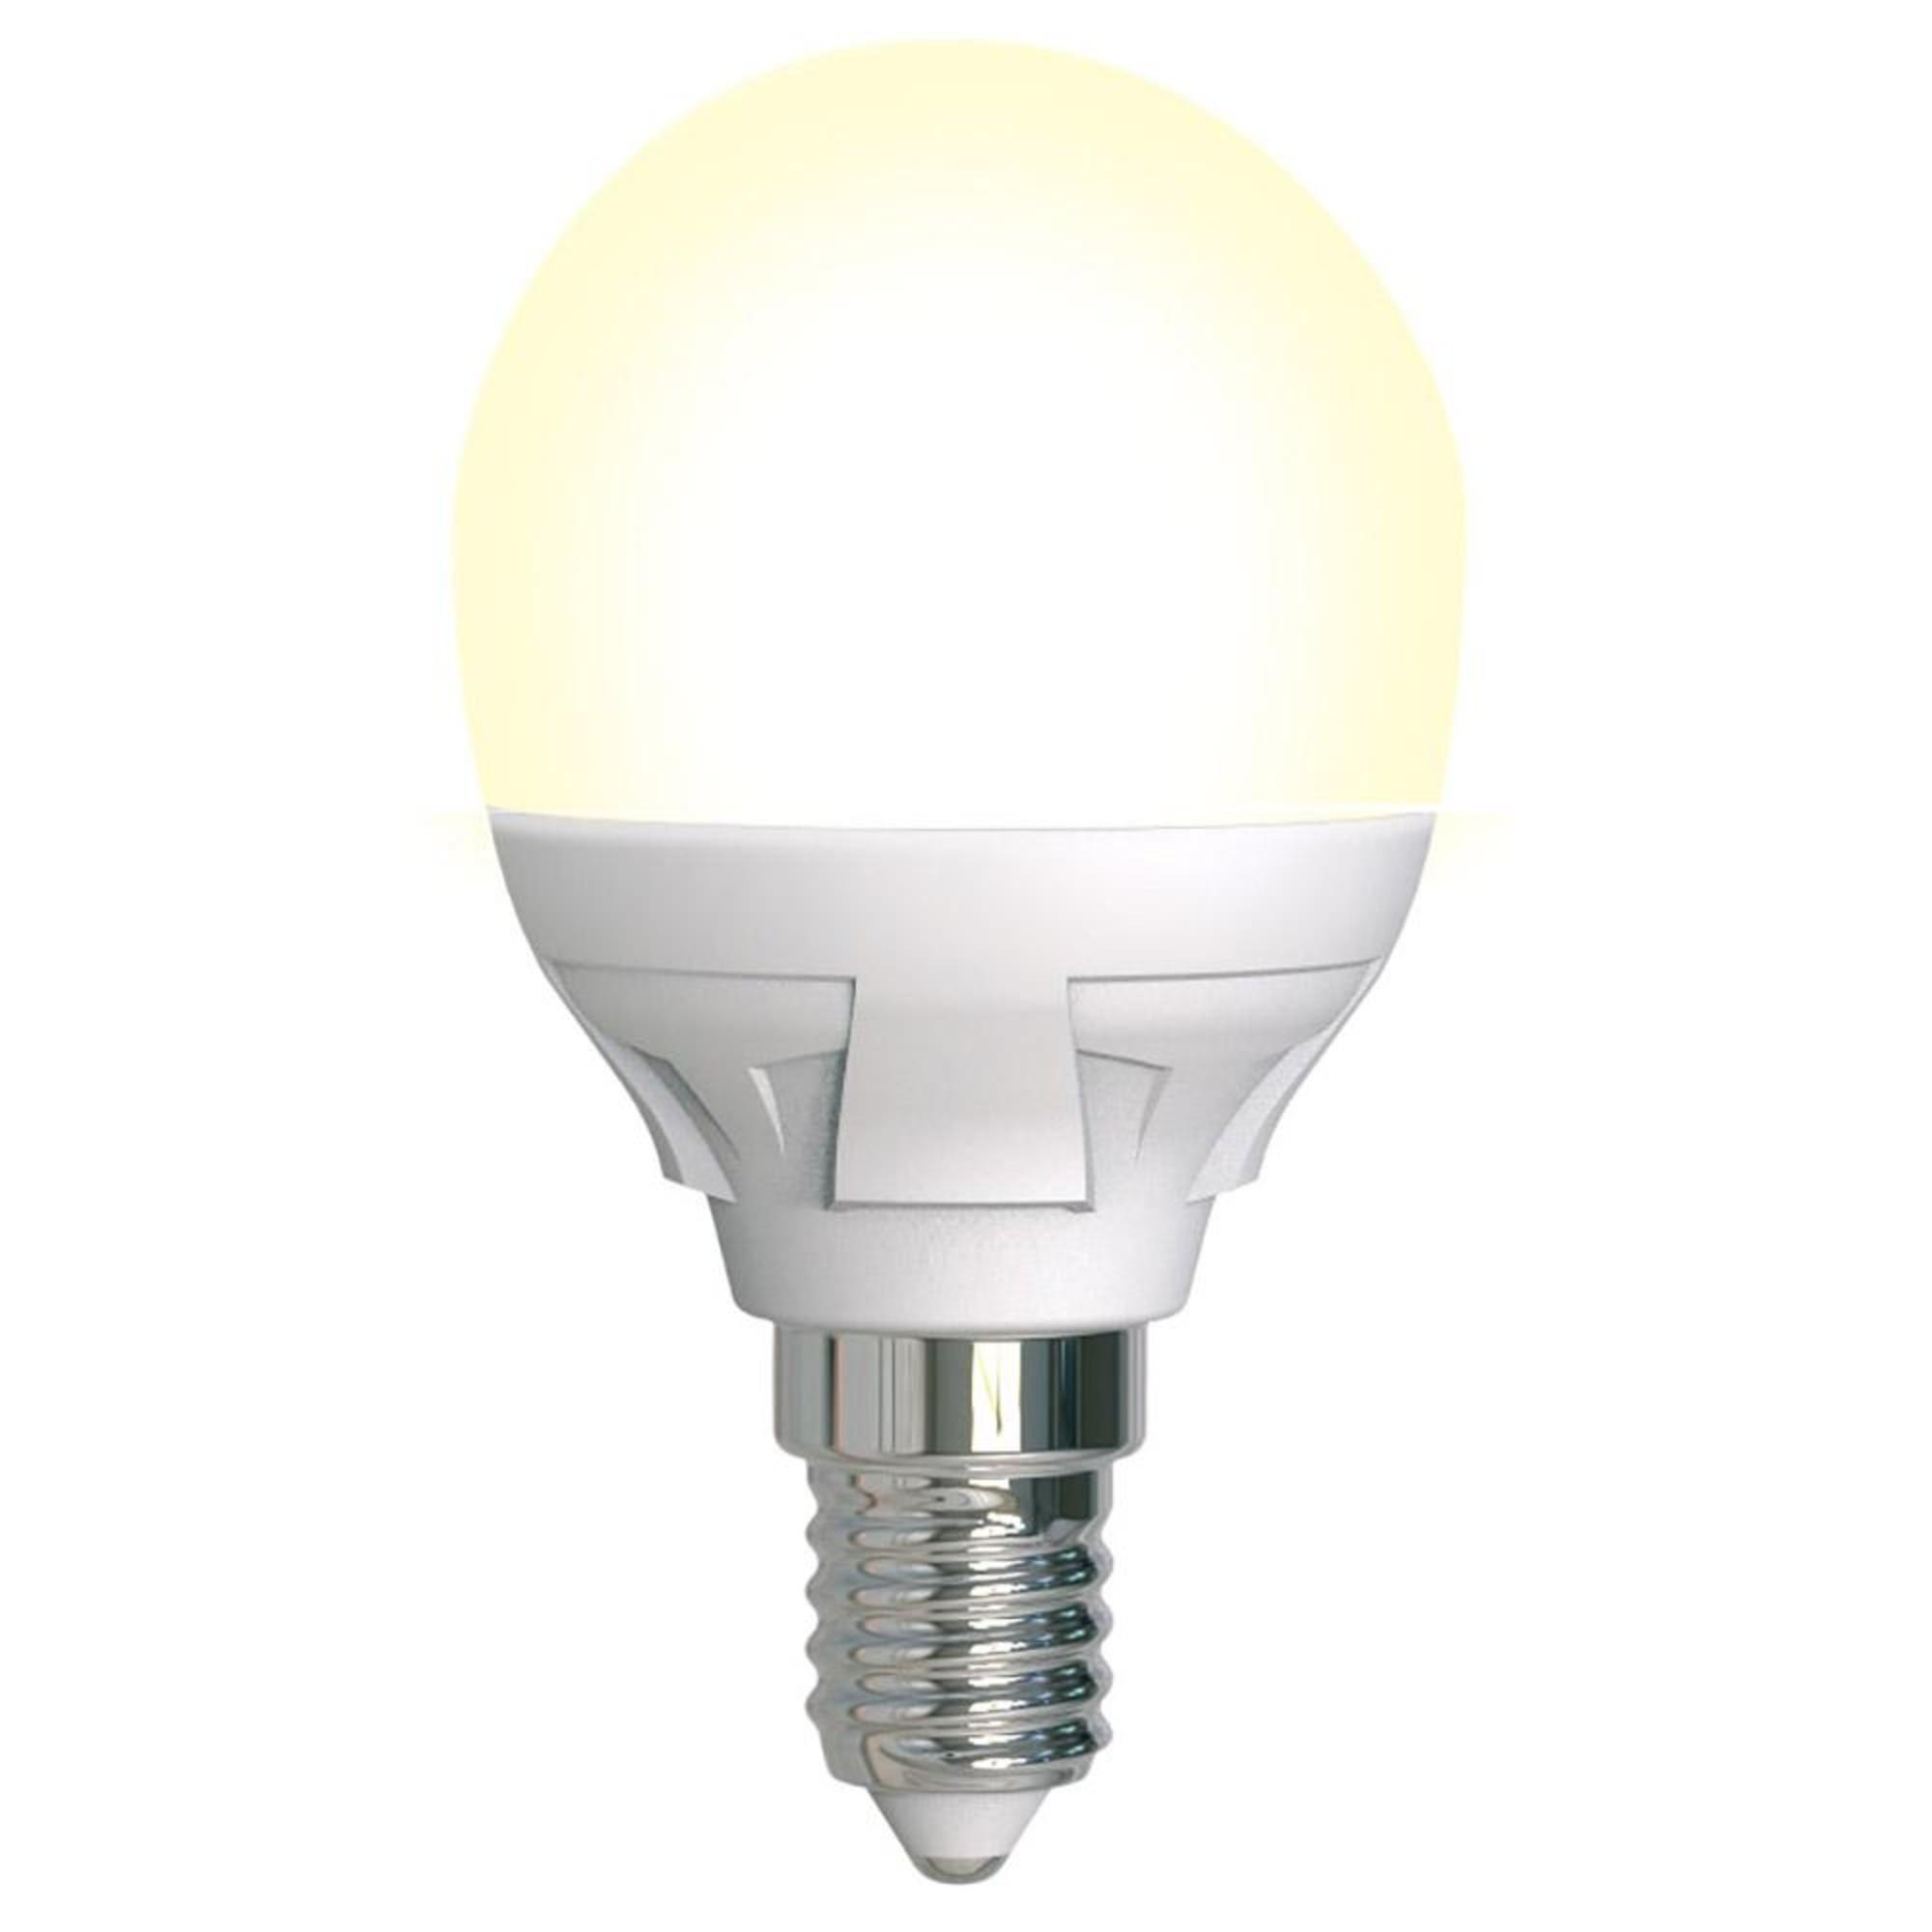 Лампа светодиодная Uniel Яркая Dimmable E14 шар 600 Лм 7 Вт теплый белый (желтый)